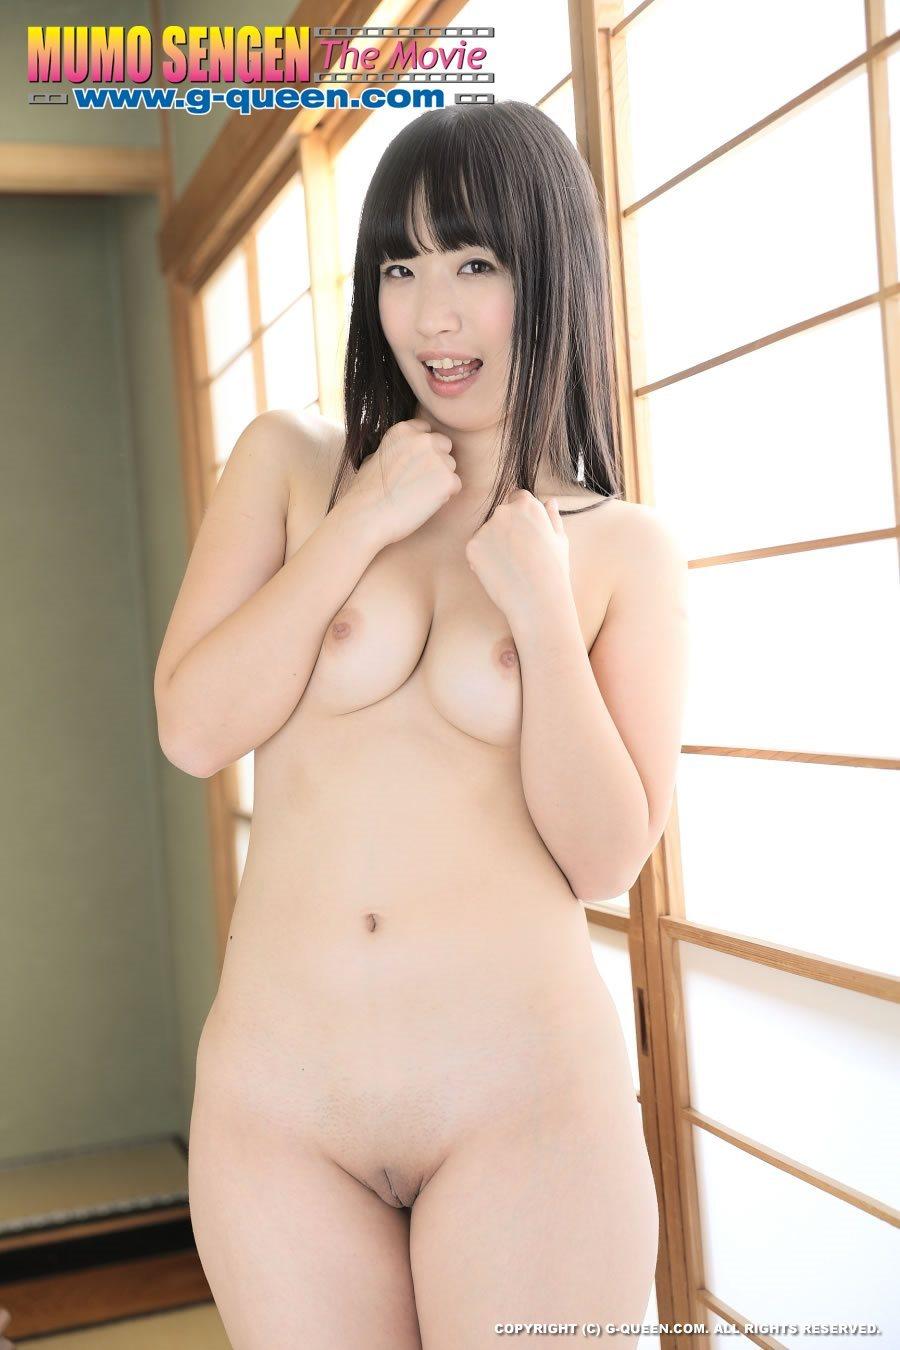 18 Shaved Pussy rikitake shaved pussy japan mumosengen free hd wallpapers